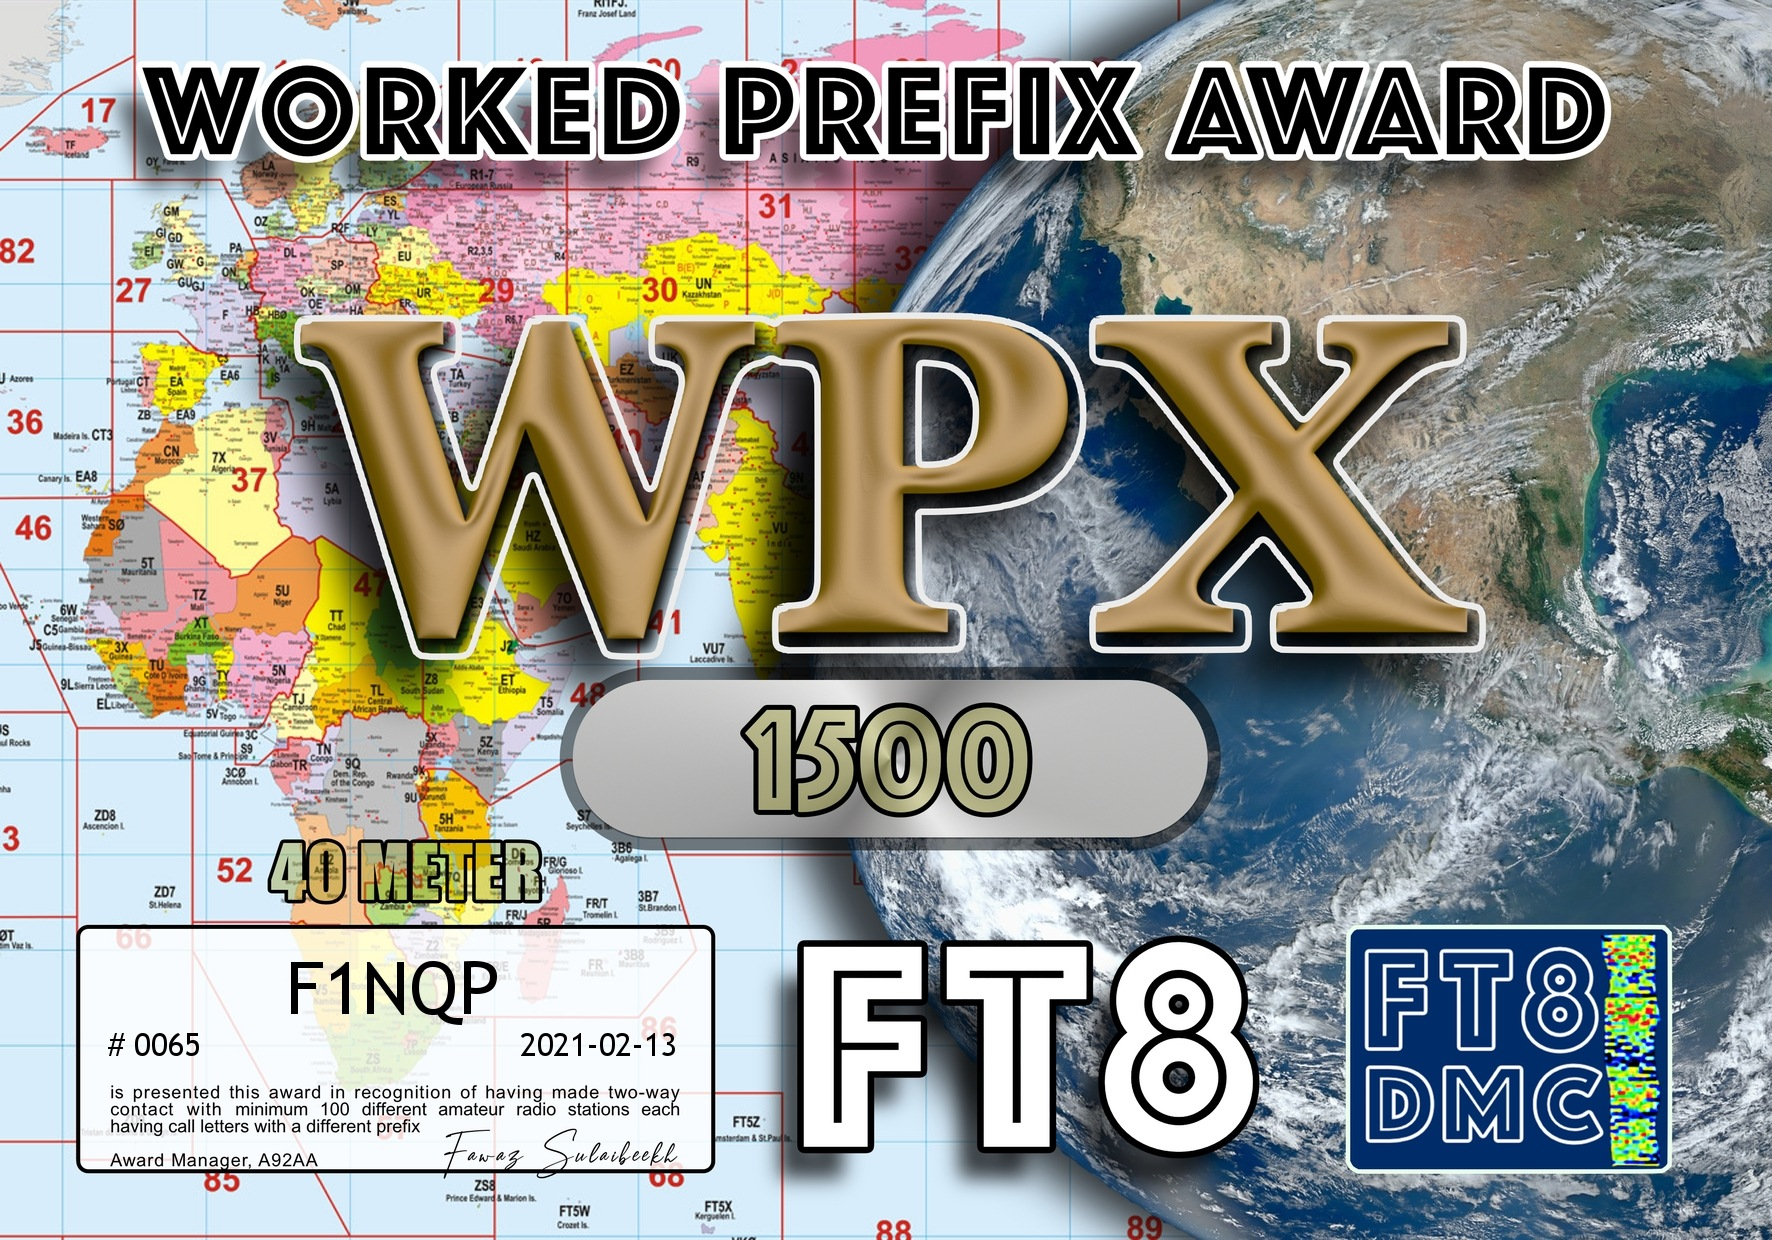 F1NQP-WPX40-1500_FT8DMC.jpg